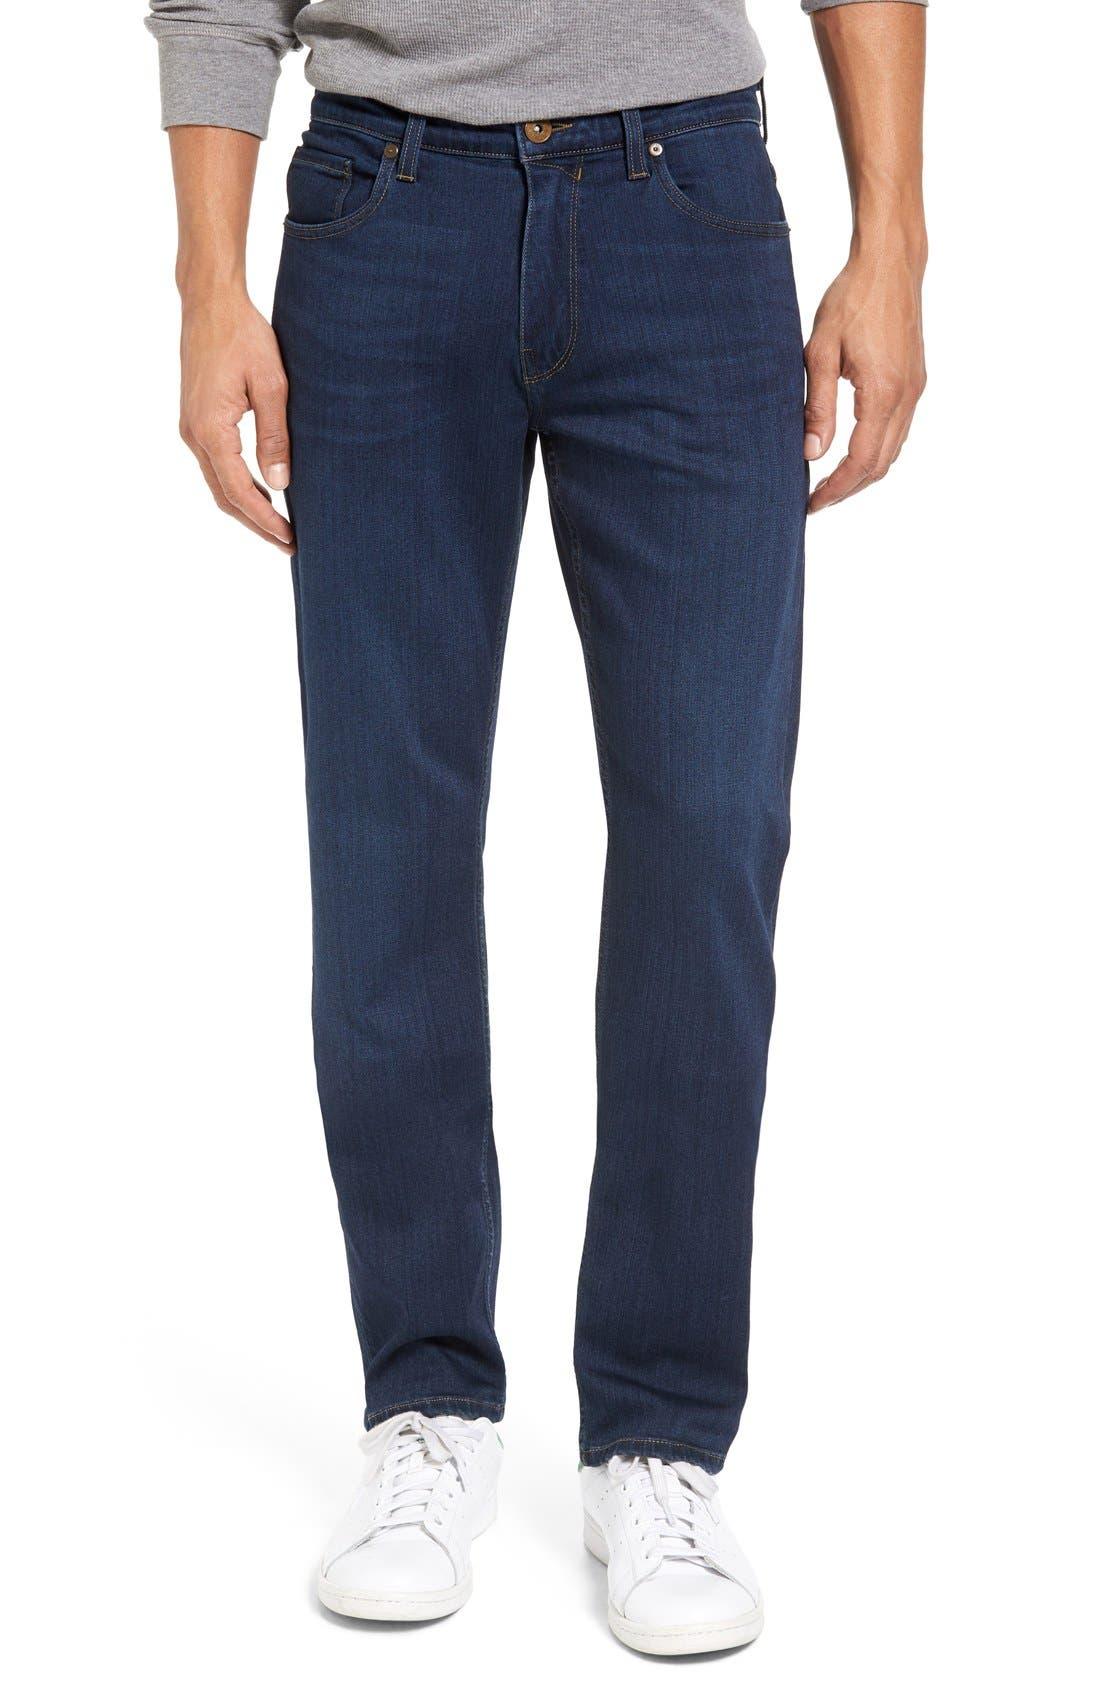 Main Image - PAIGE Transcend - Federal Slim Straight Leg Jeans (Scott)